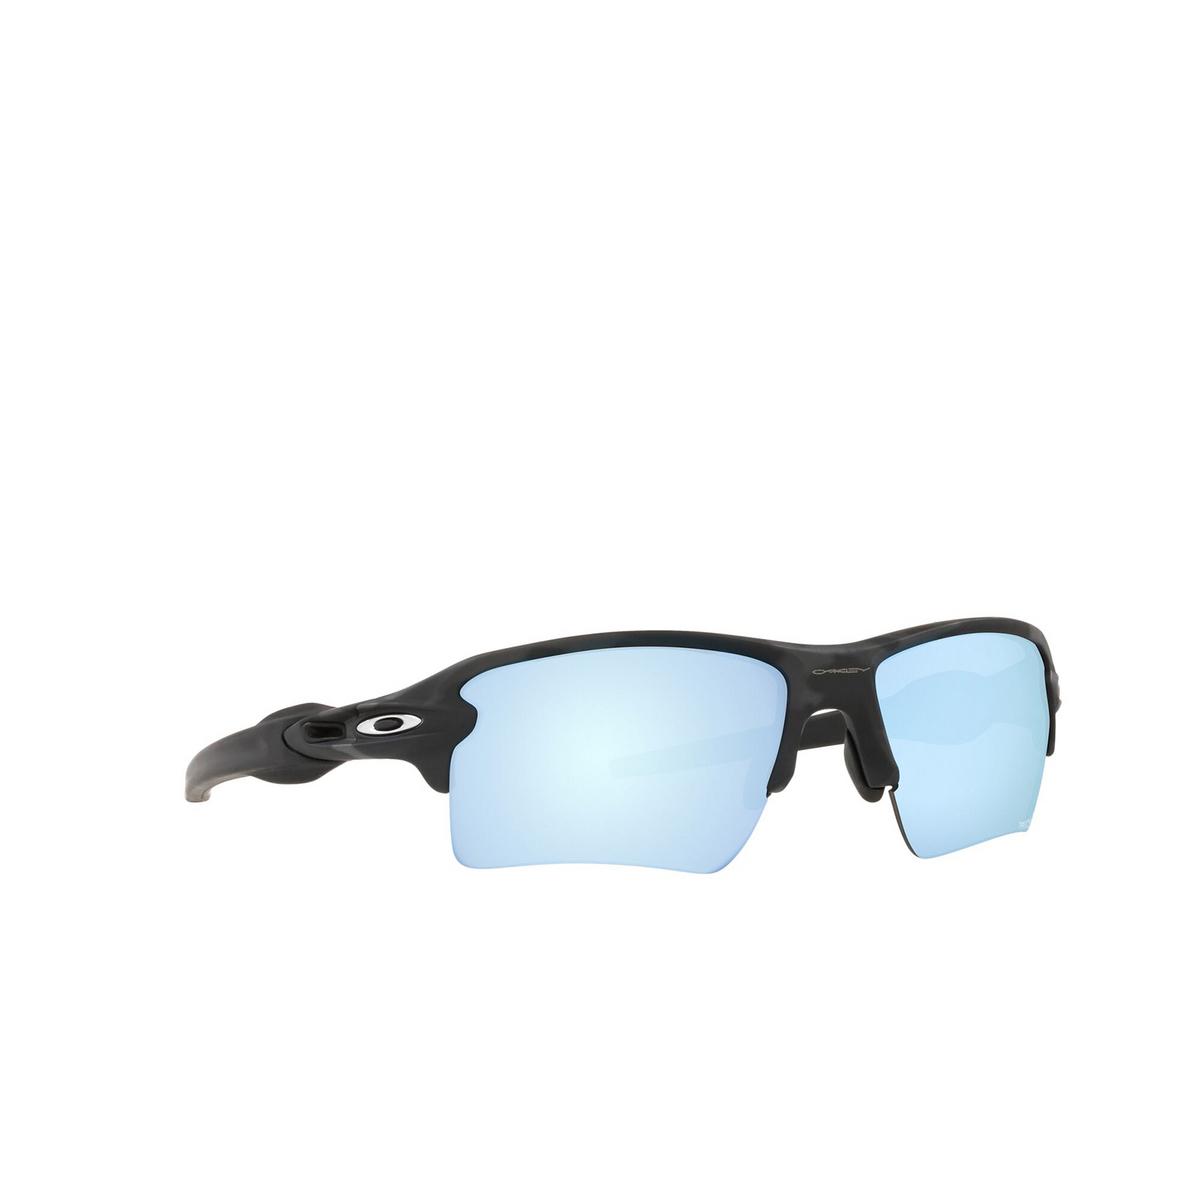 Oakley® Rectangle Sunglasses: Flak 2.0 Xl OO9188 color Matte Black Camo 9188G3 - three-quarters view.